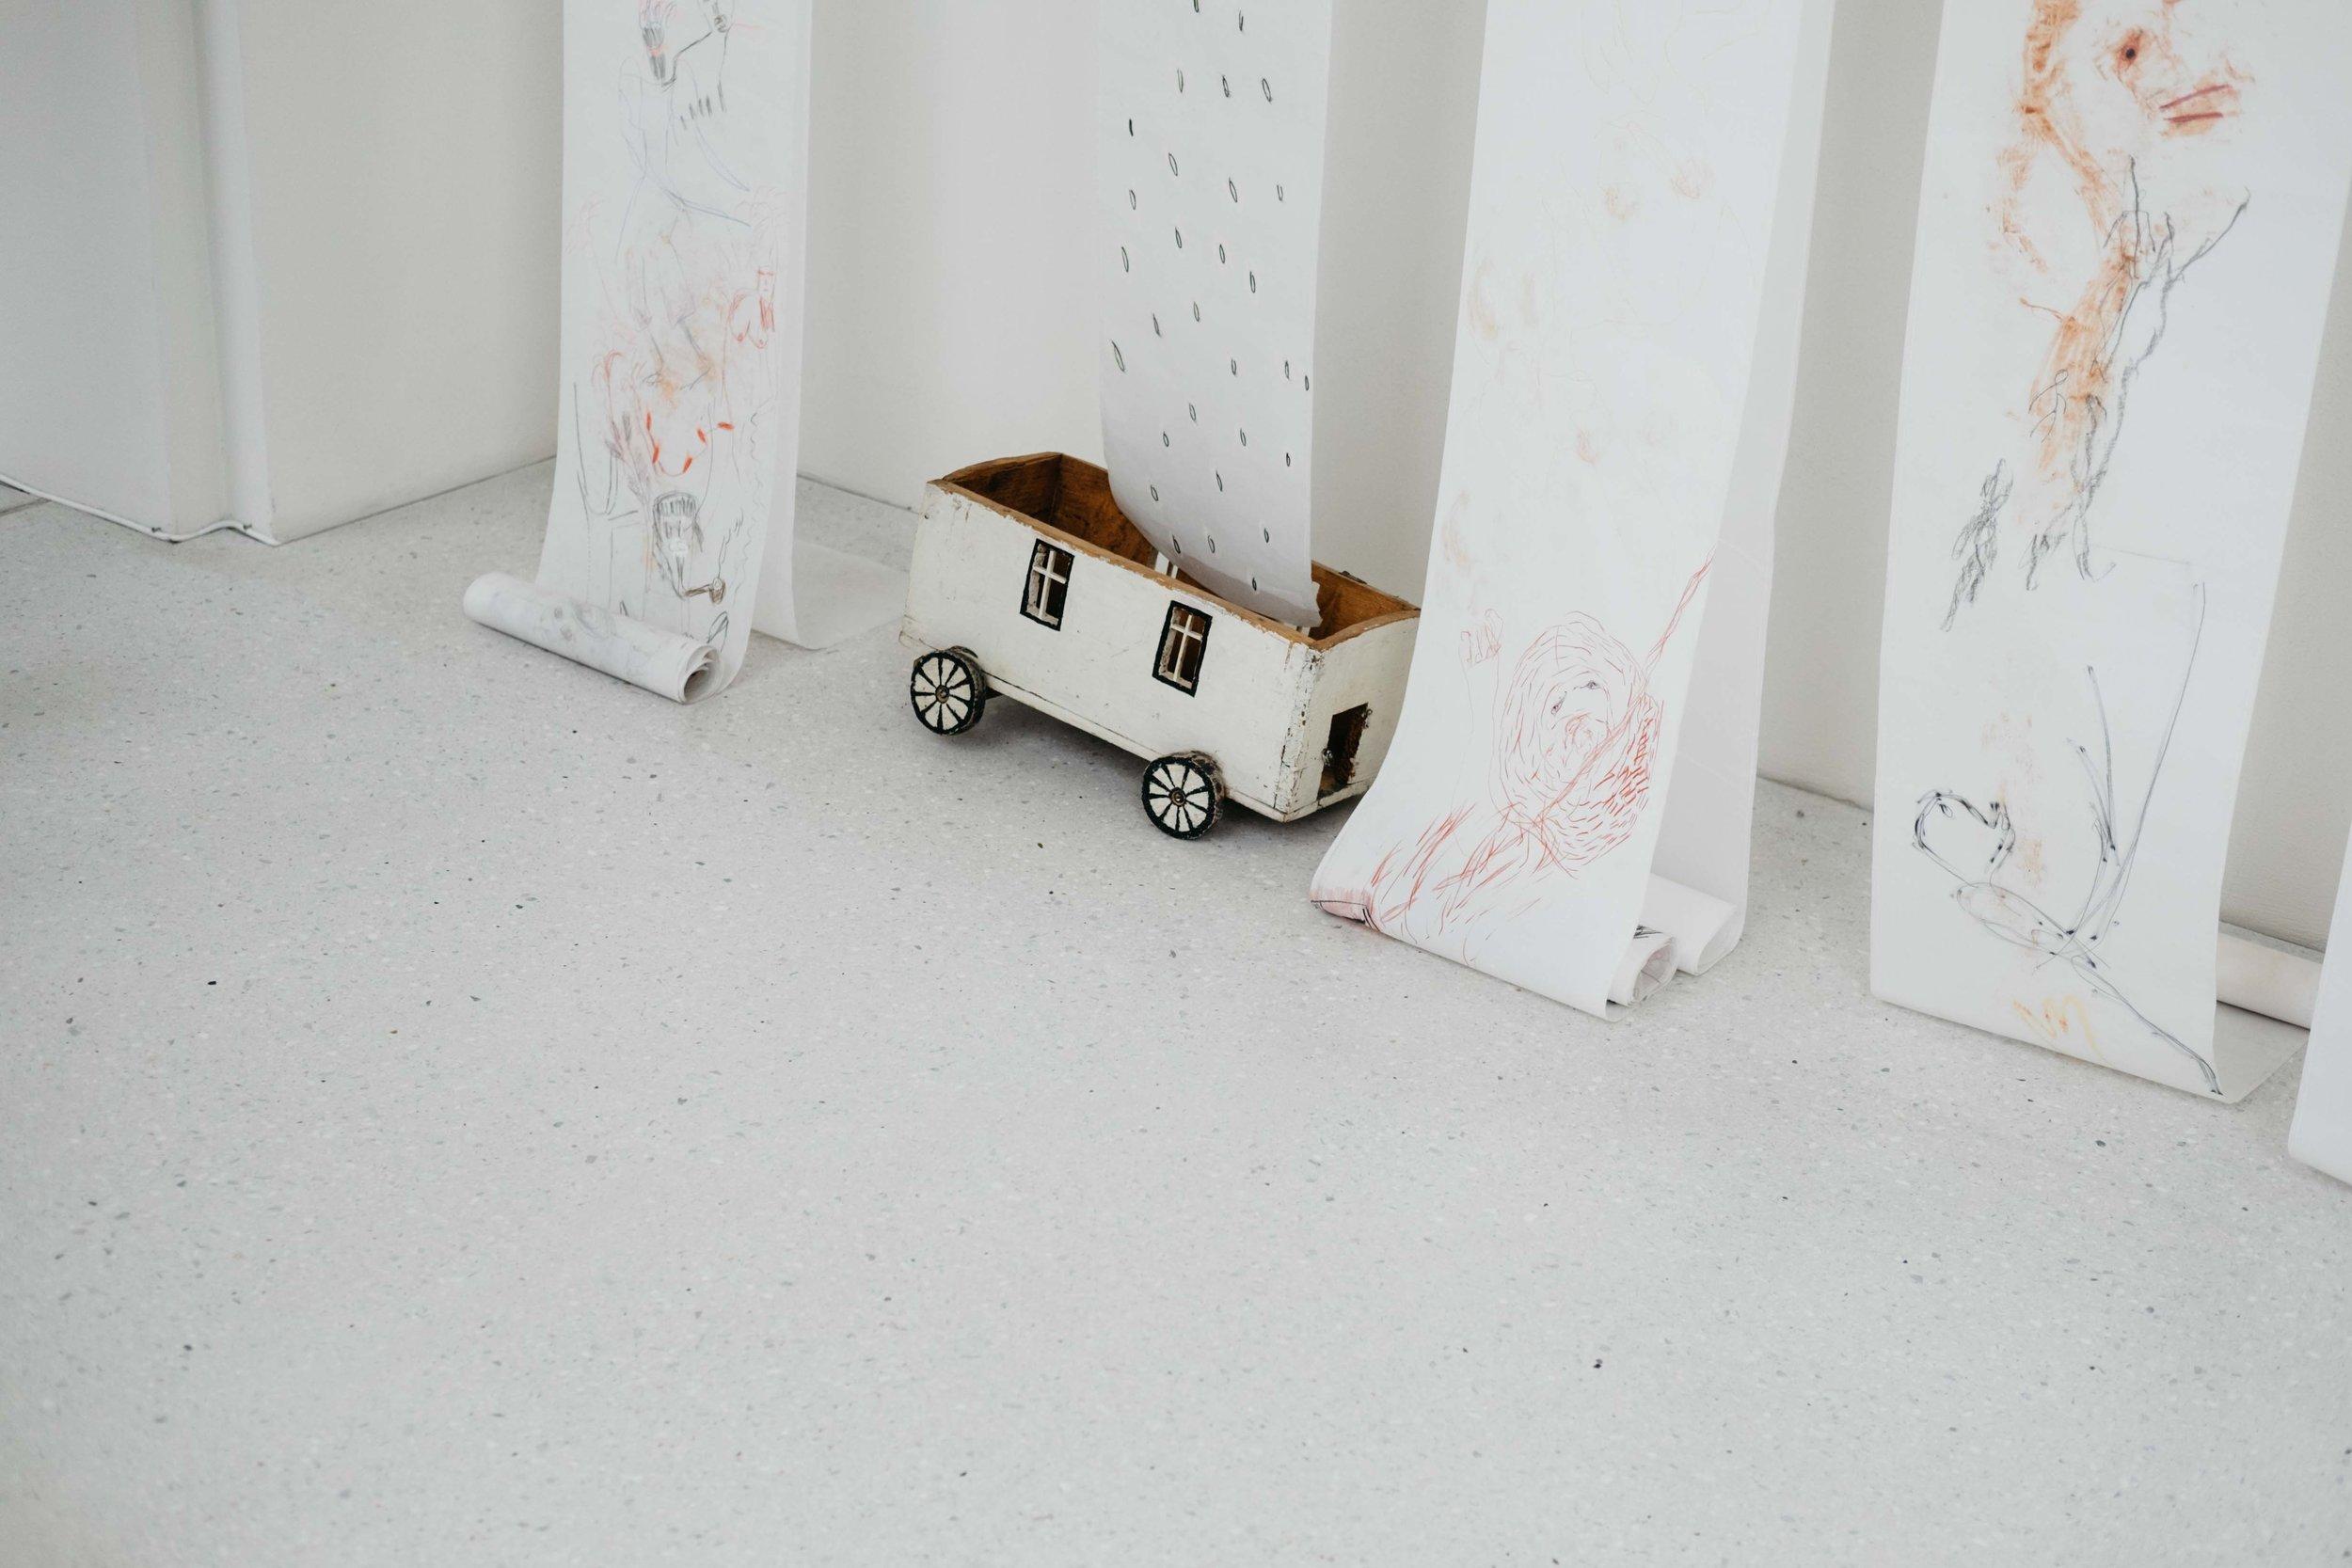 documenta14-kassel-kunst-wearecity-simonhariman-2017-83.jpg